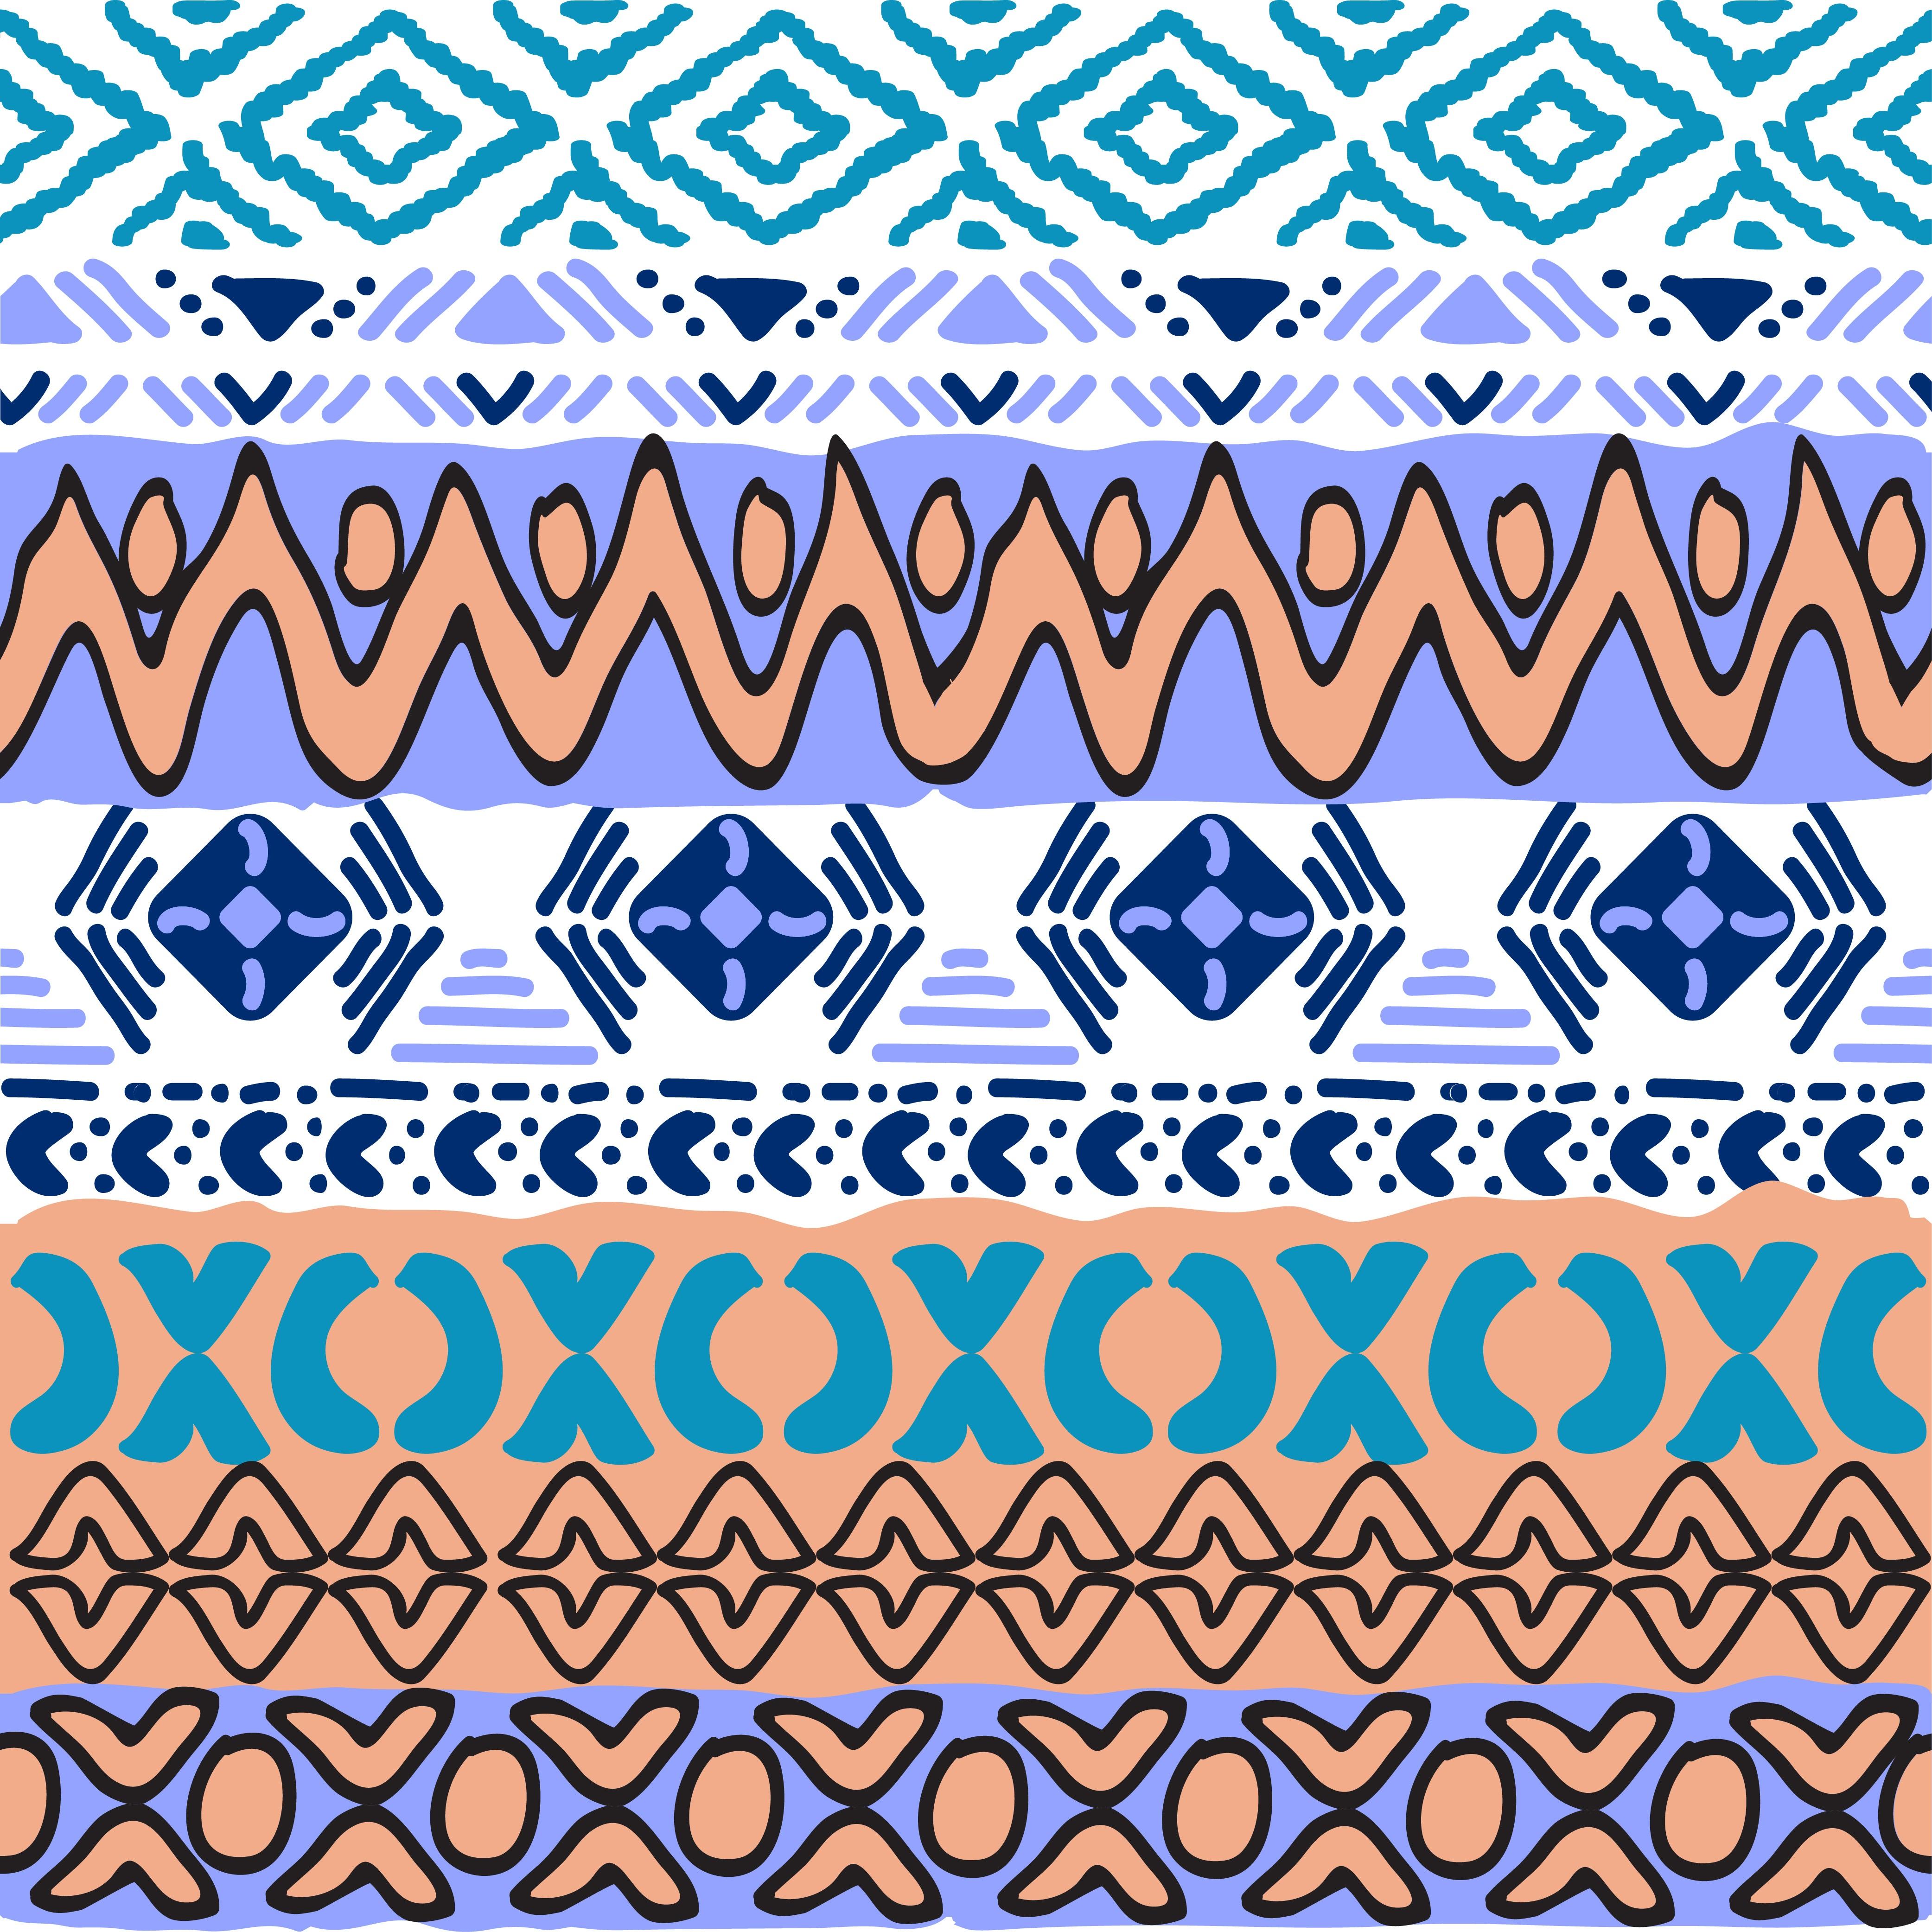 American southwest, art revival, Indian reservation, historical art, Hopi, Zuni, Pueblo, Navajo, Apache